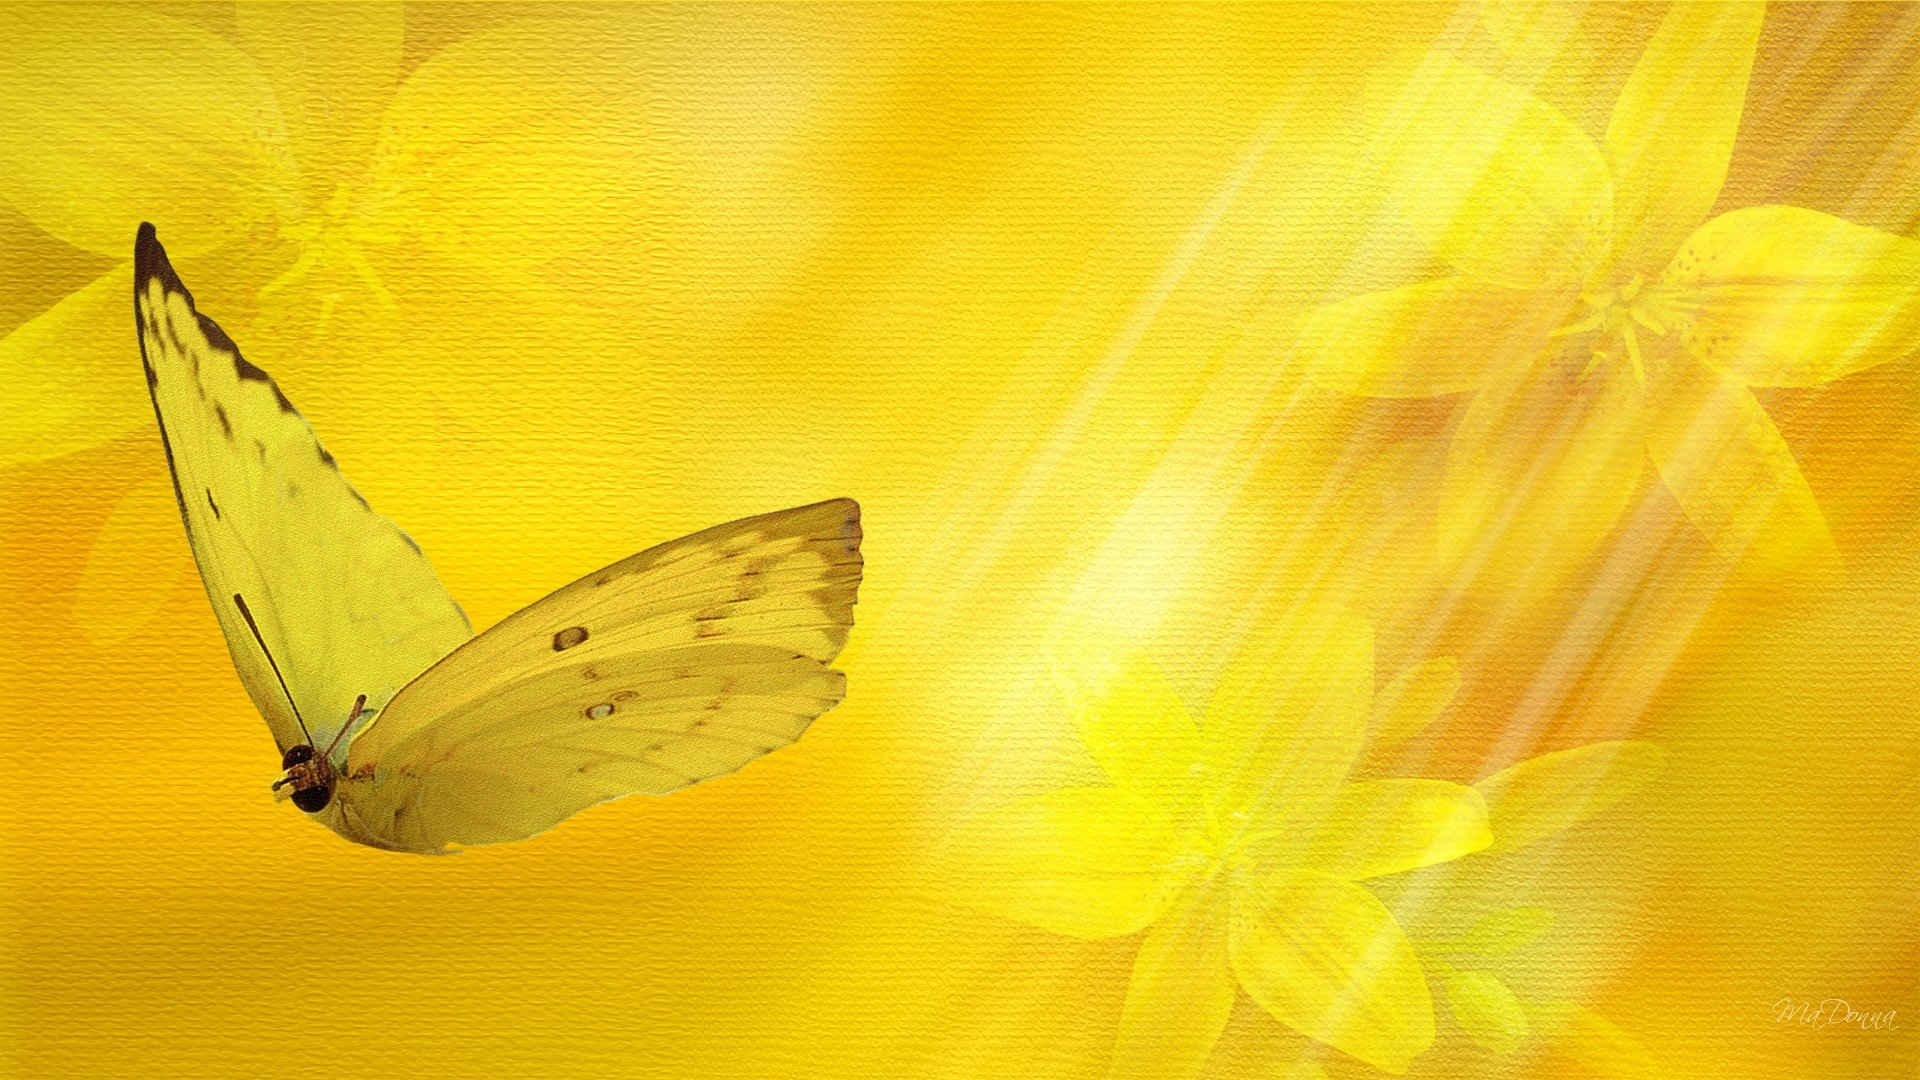 Картинки с бабочками фон для презентации